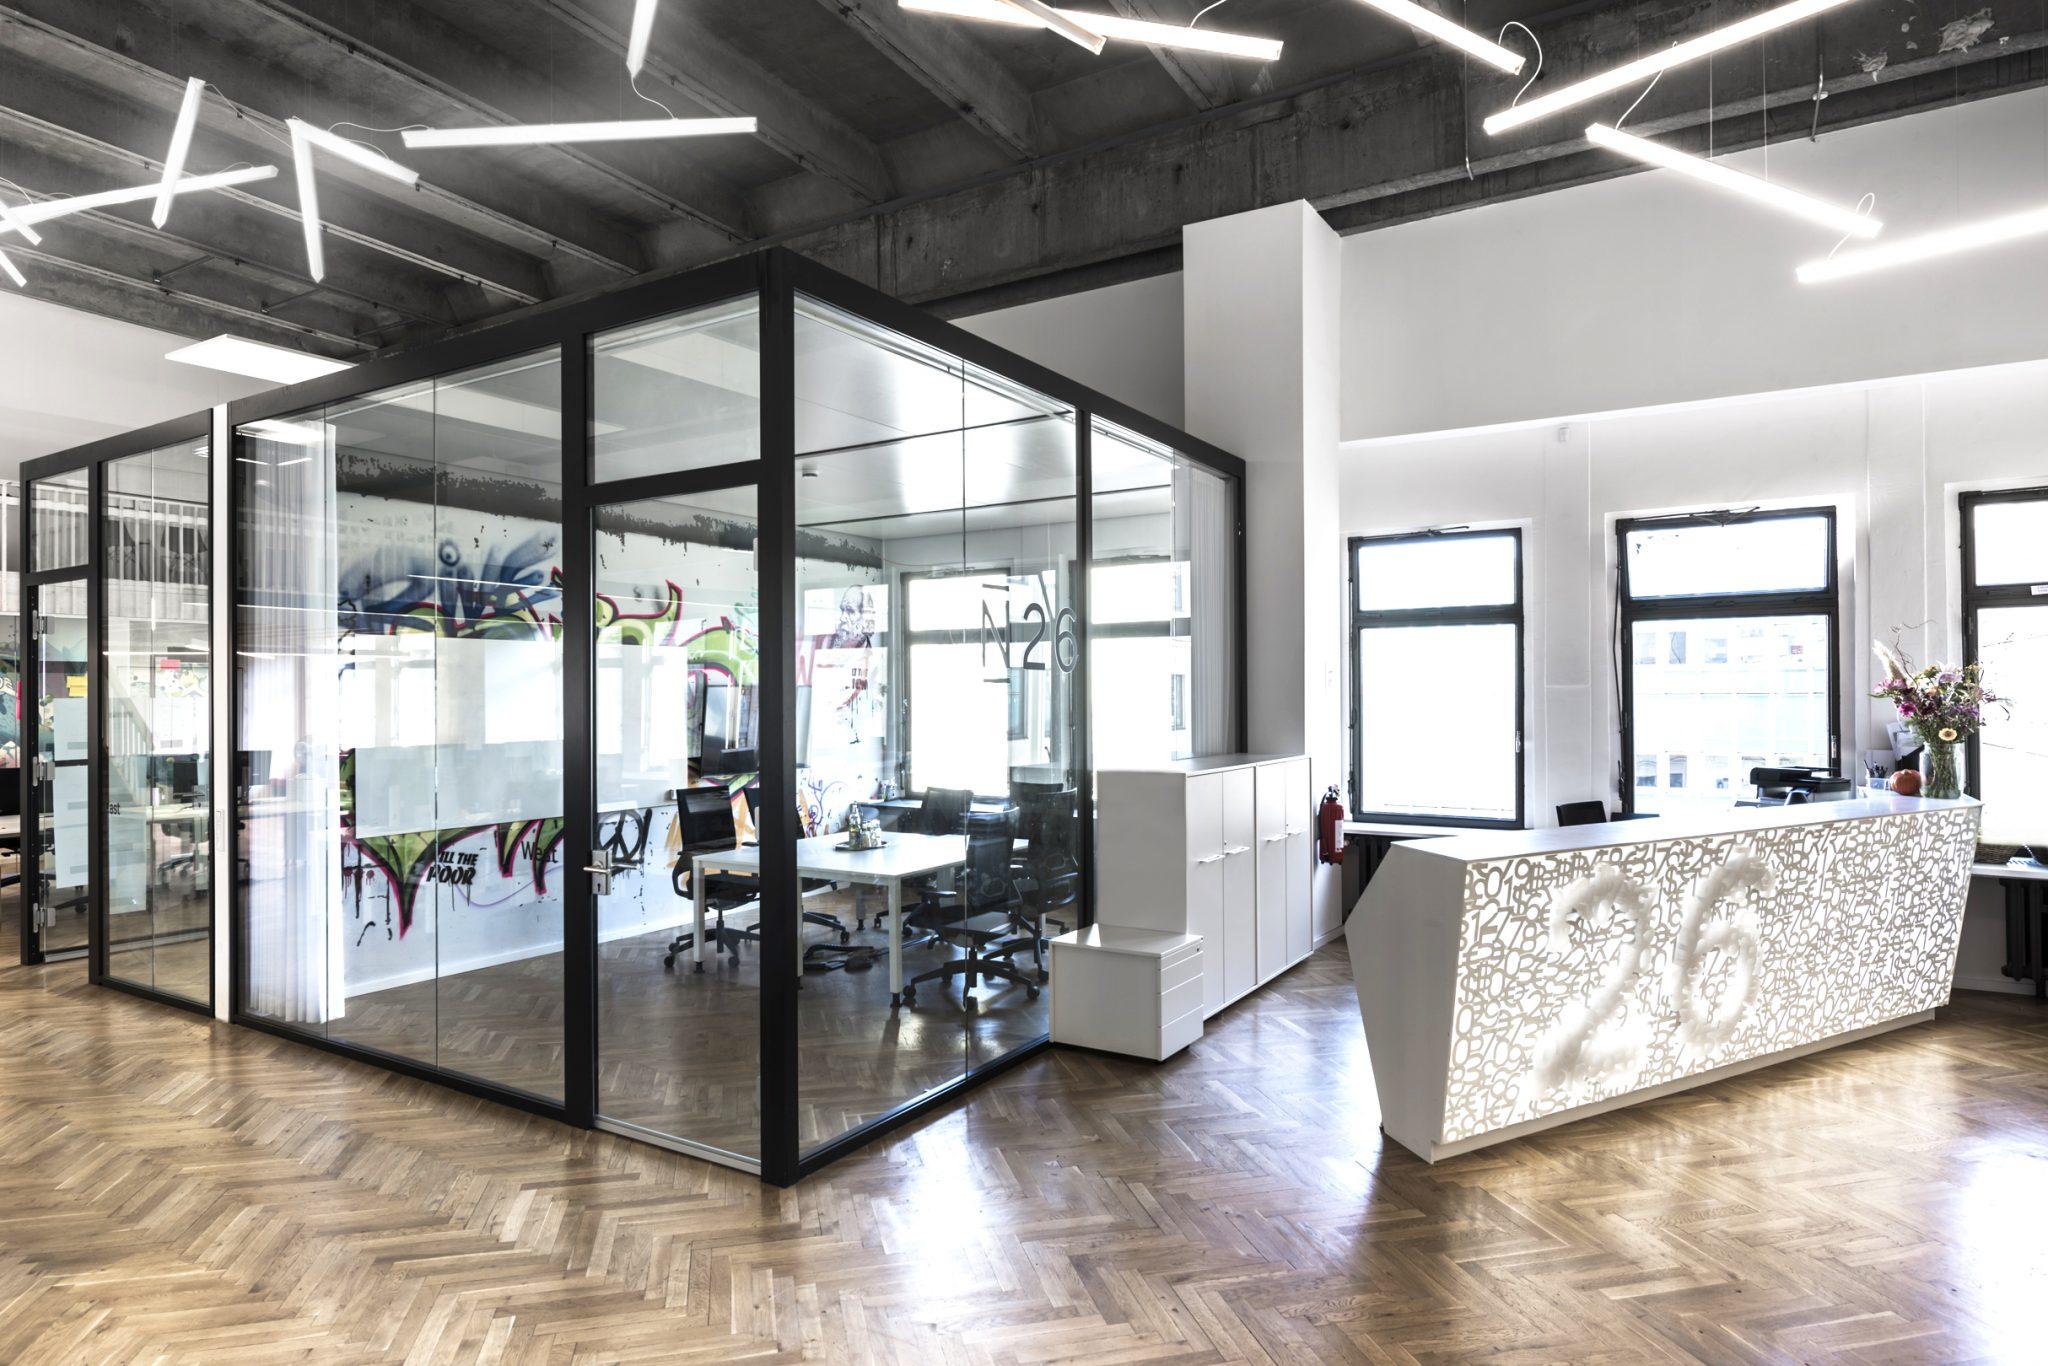 N26 Office HQ In Berlin By TKEZ Architecture